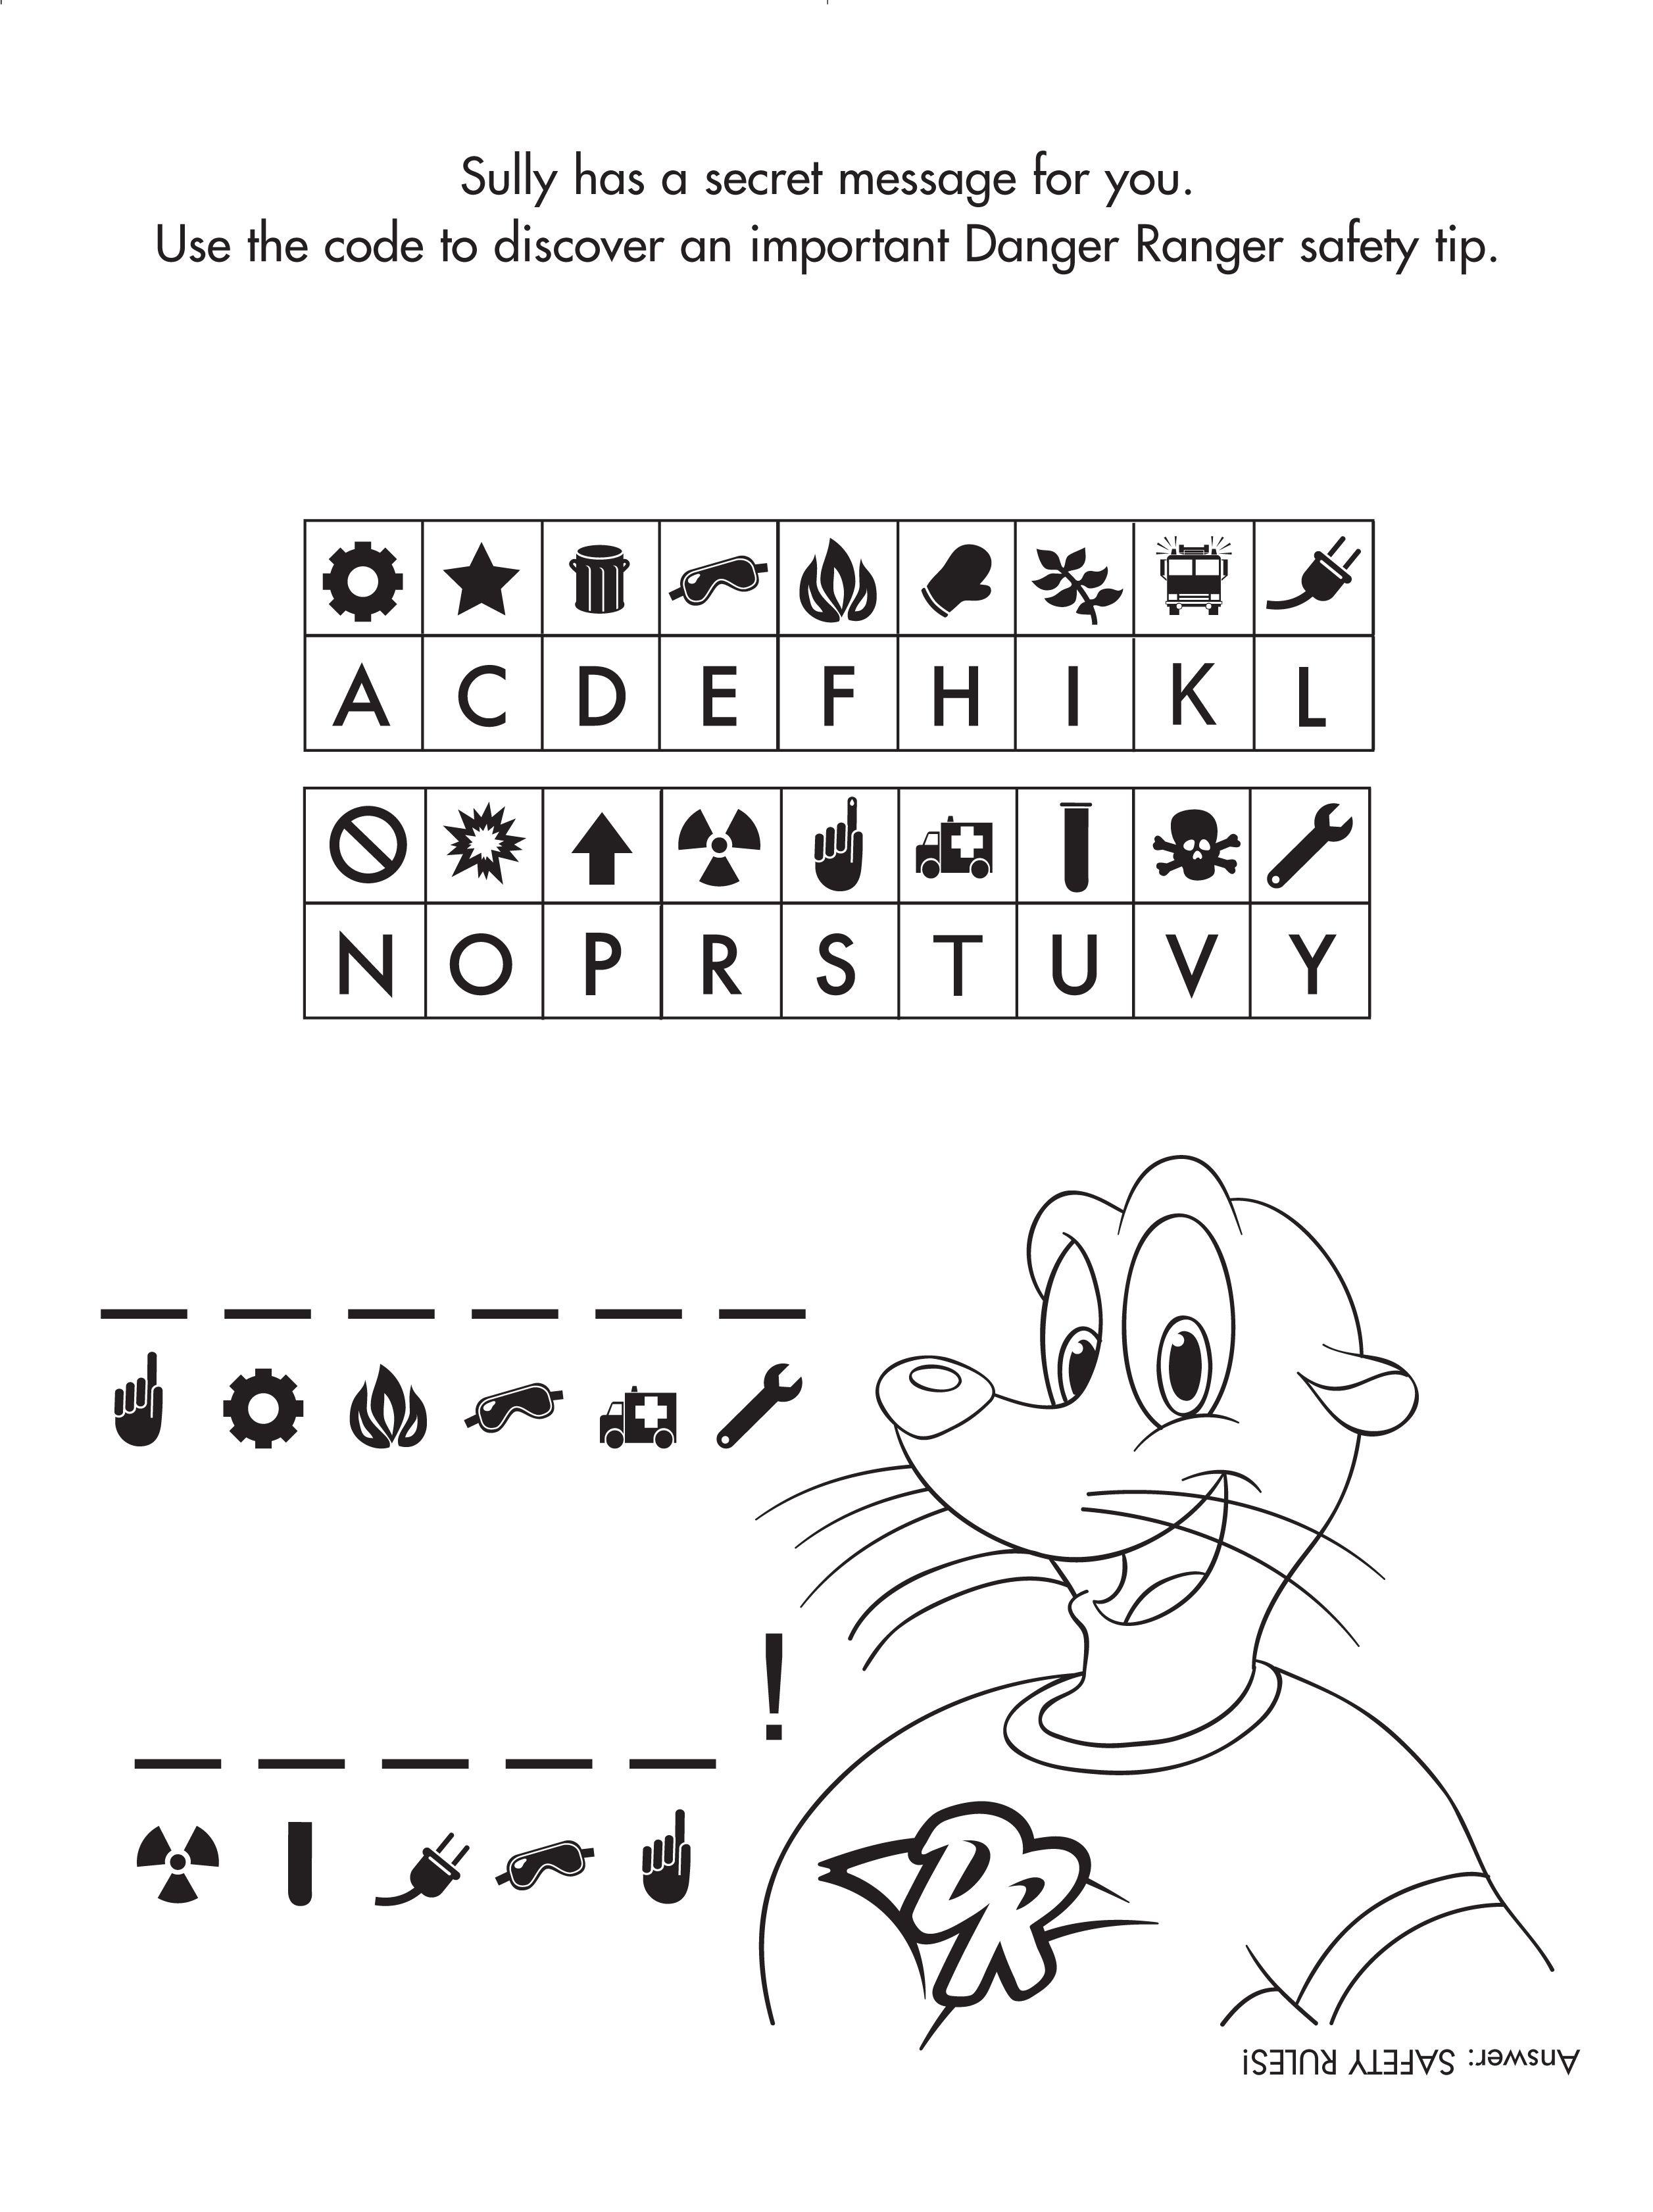 Decode This Danger Ranger's Secret Message! #freeprintable - Free Printable Activity Sheets For Kids